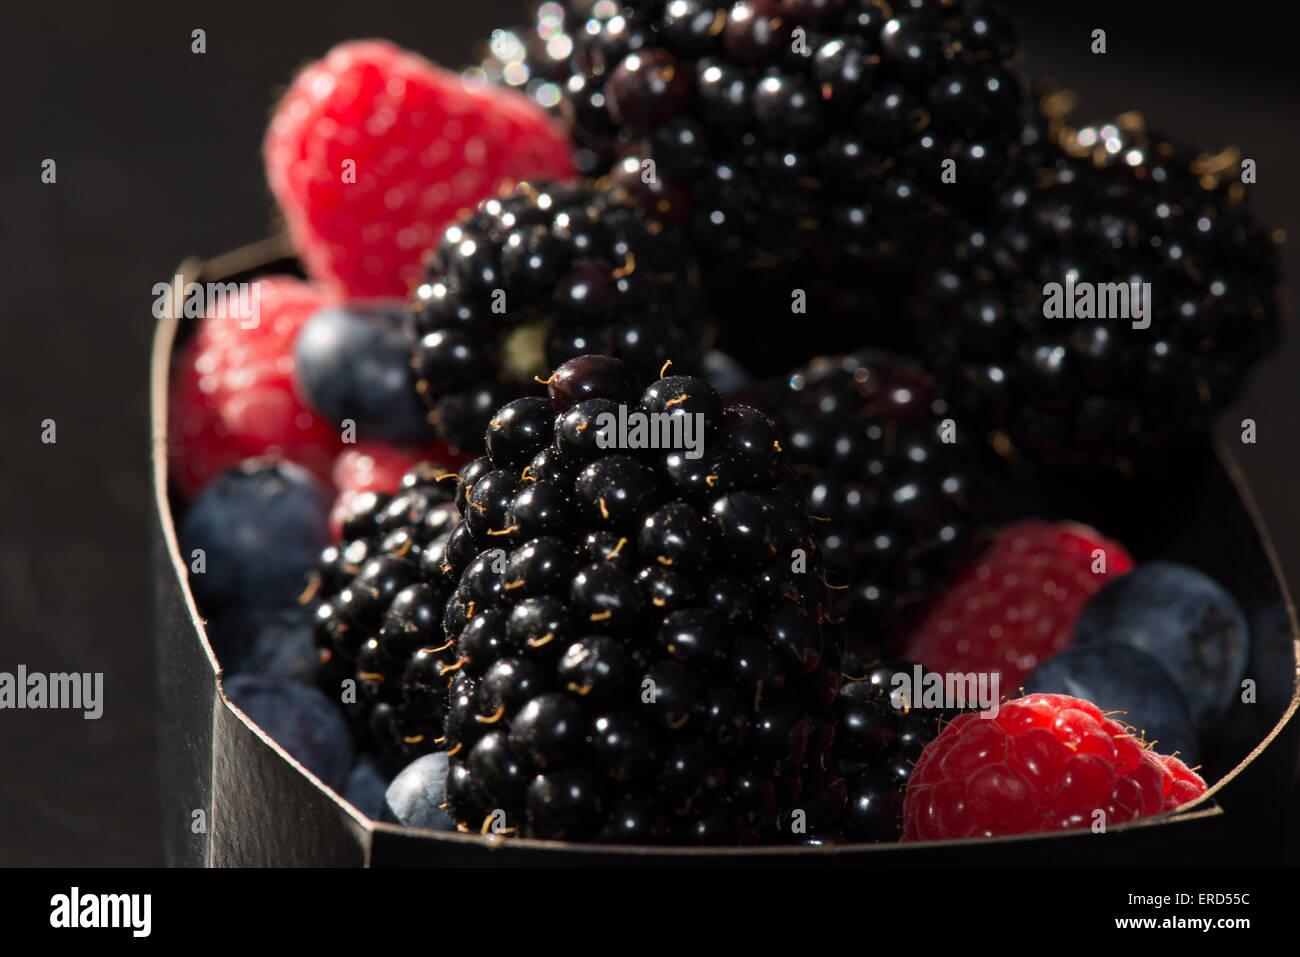 Fruit, raspberry, blackberry - Stock Image